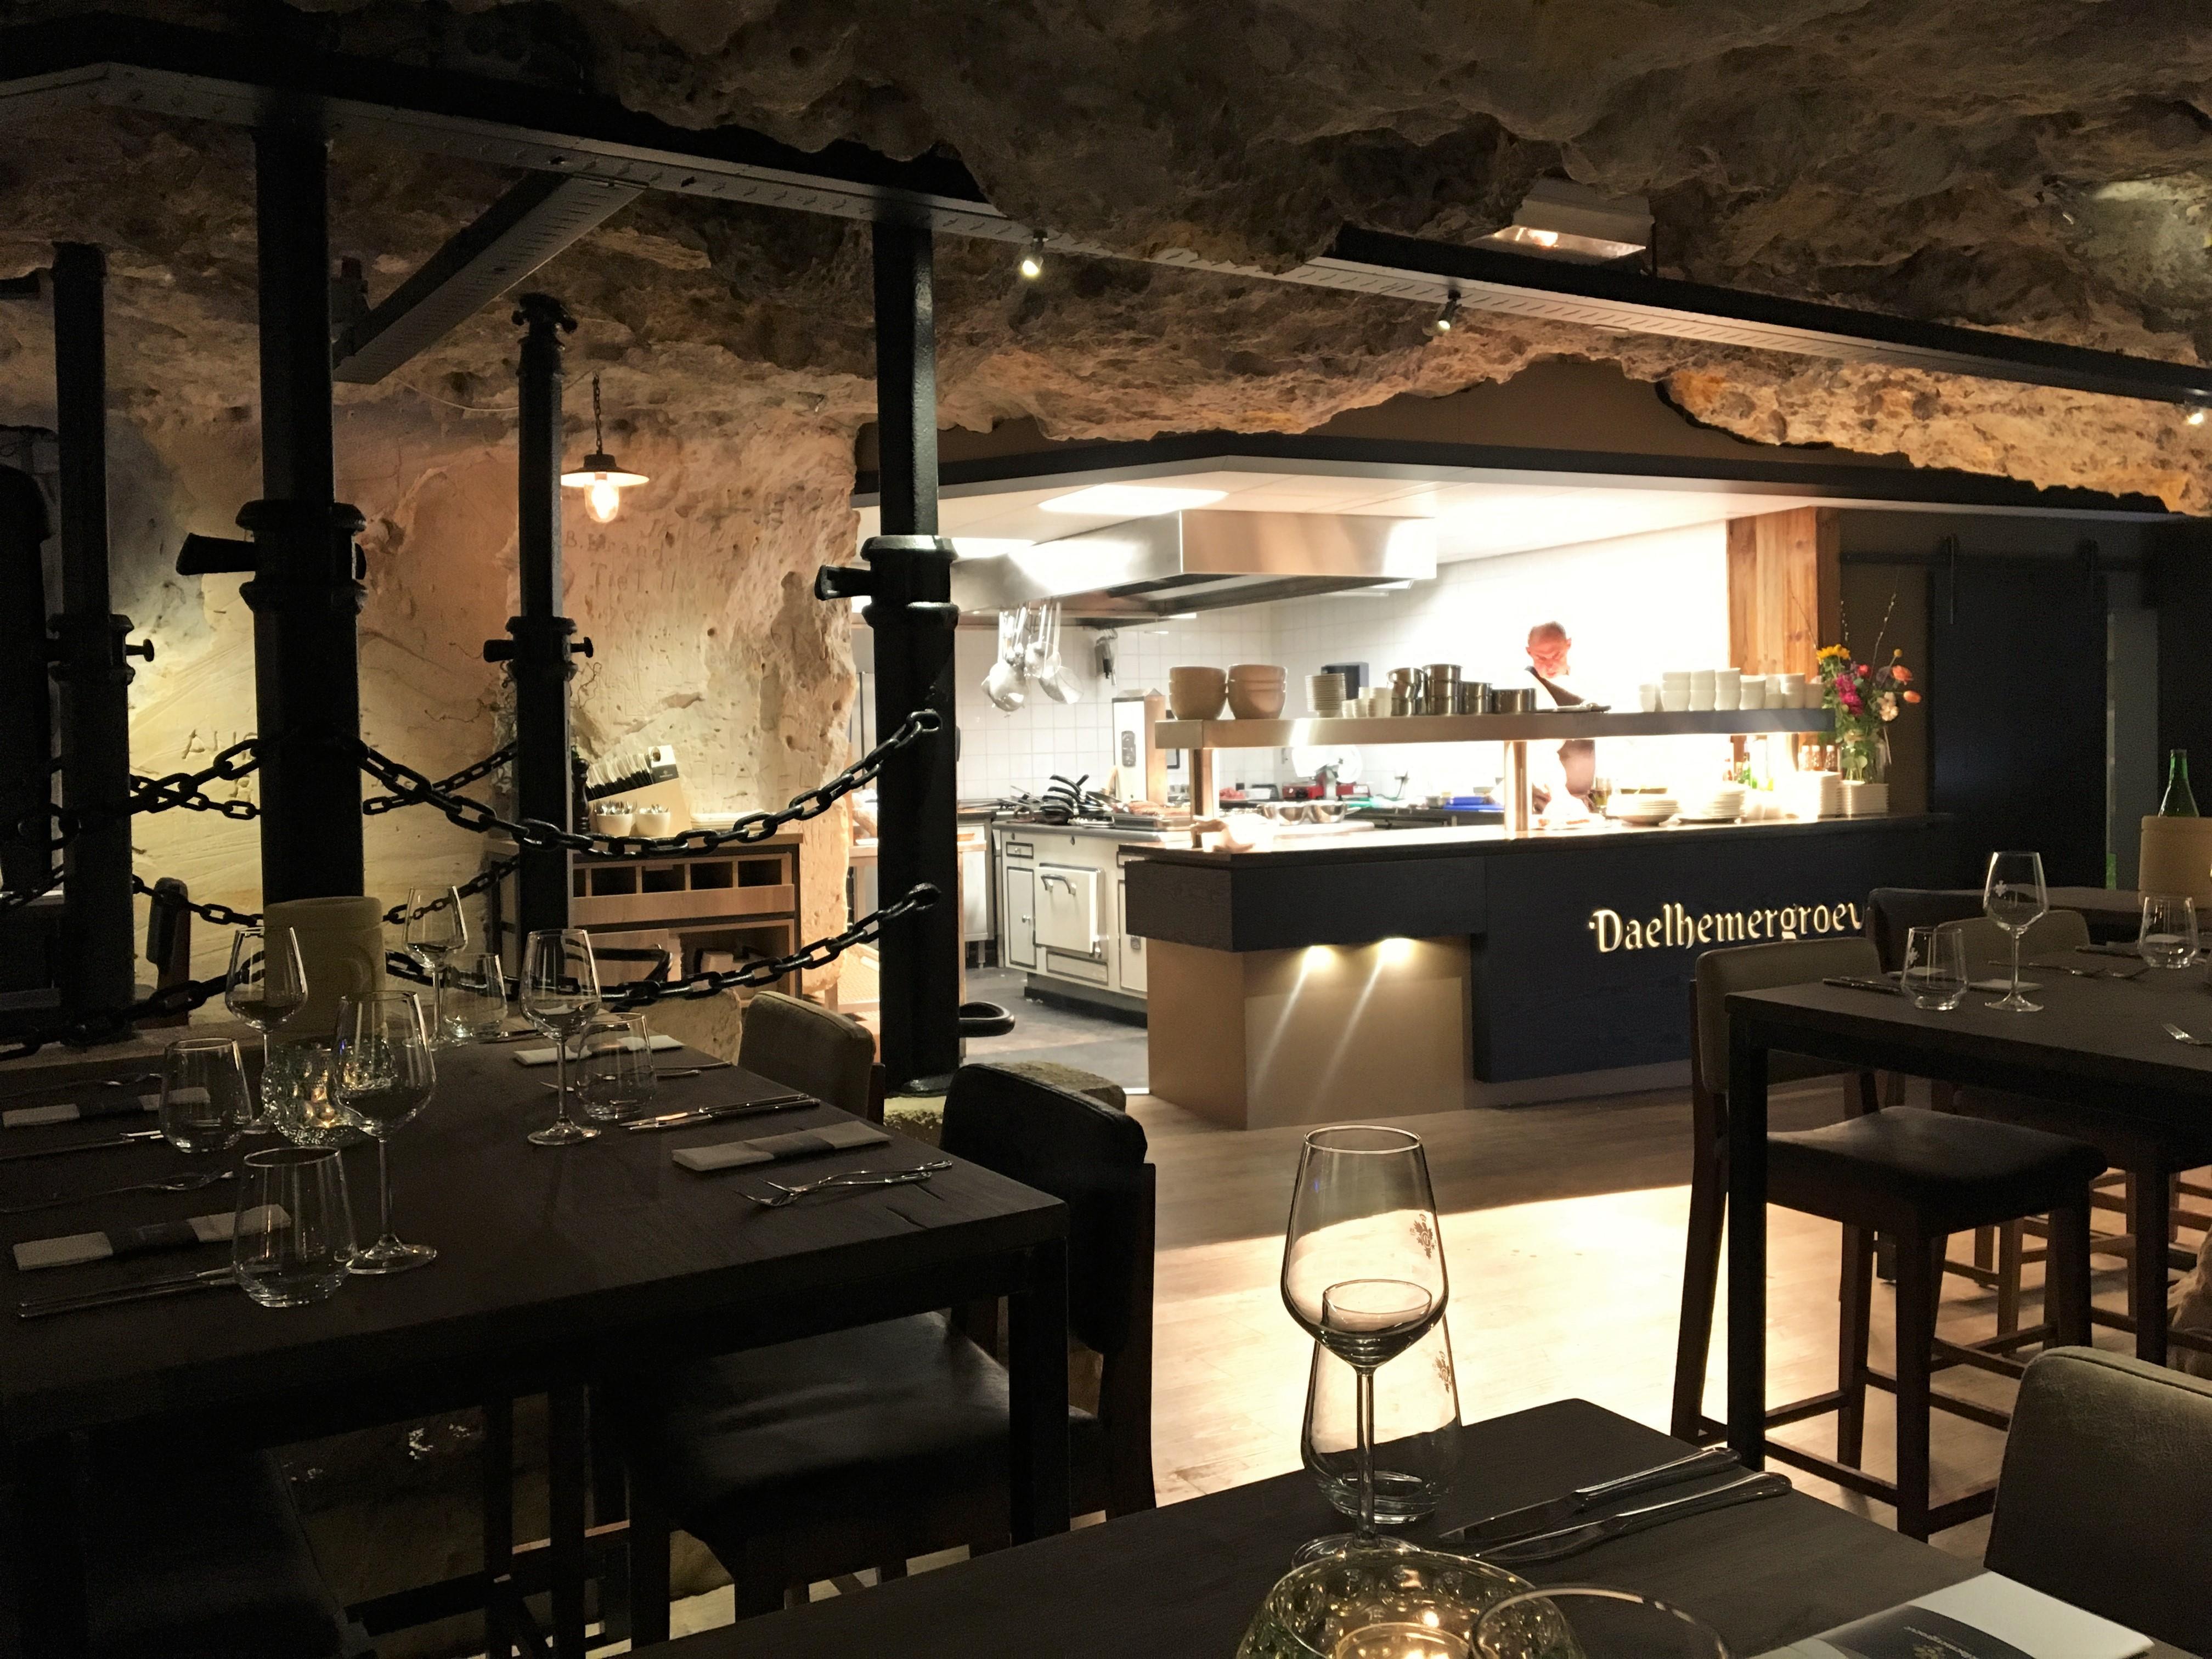 Daelhemergroeve - ondergronds dineren in Valkenburg